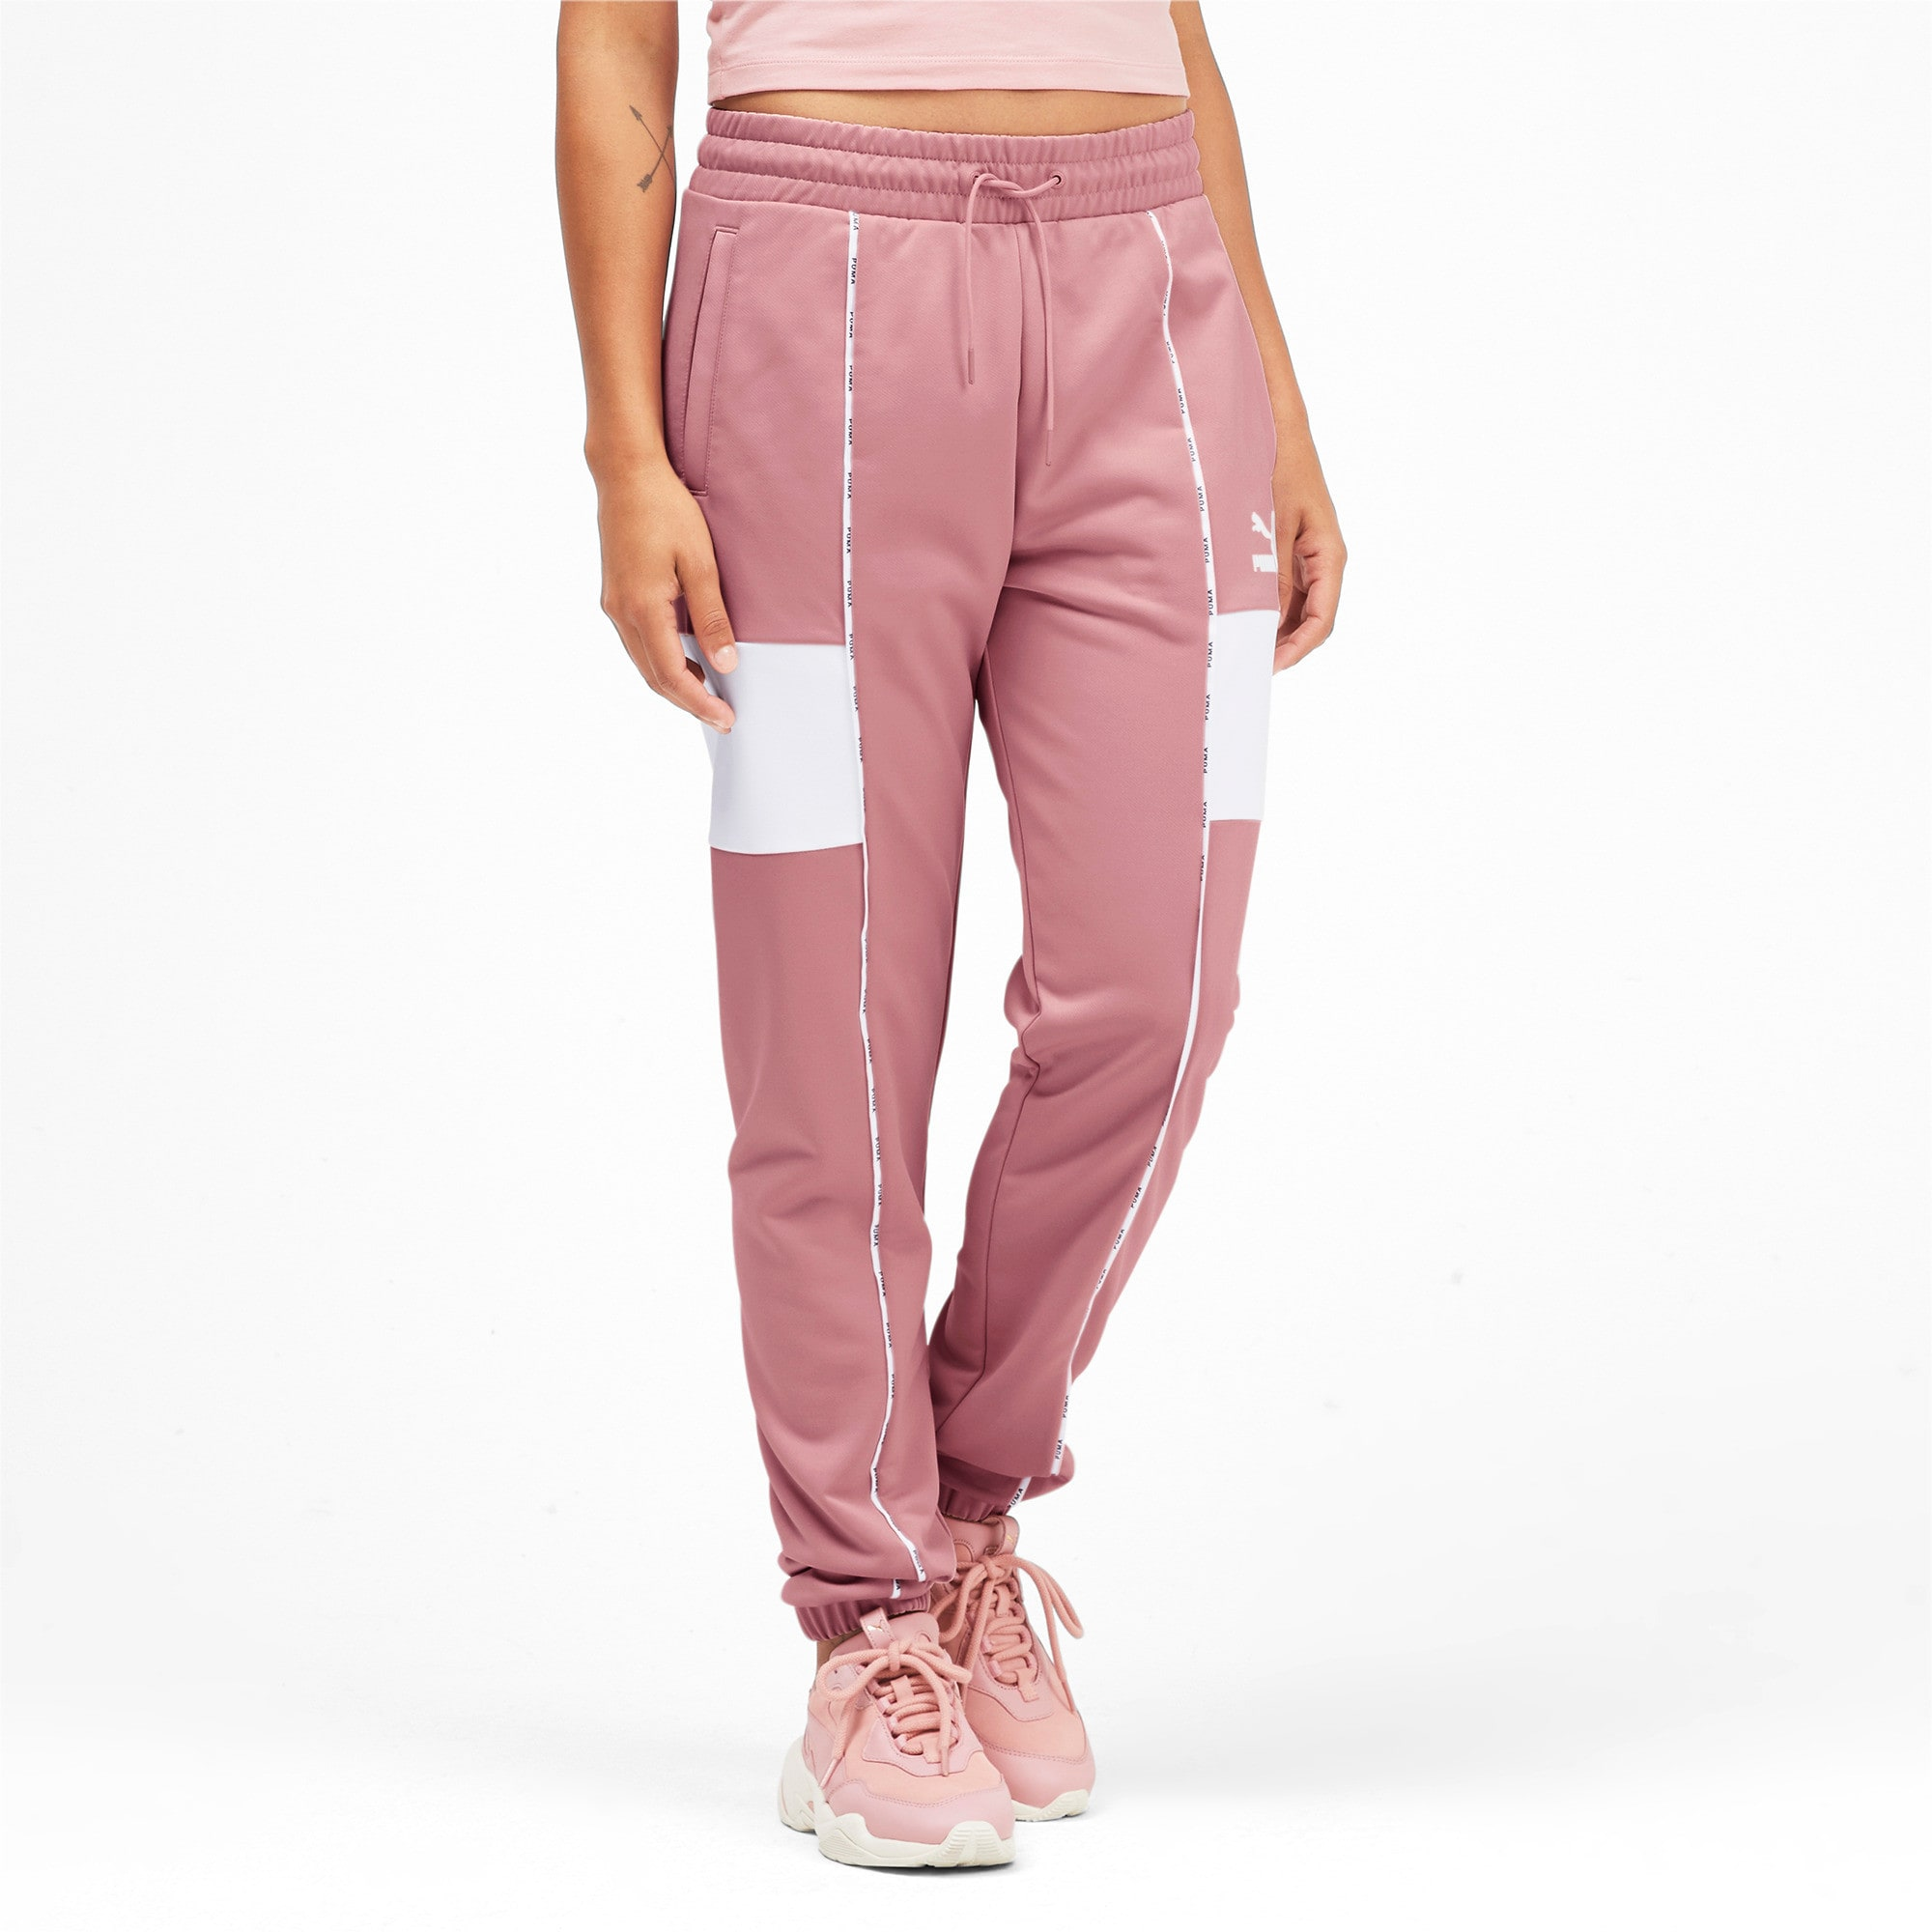 Miniatura 2 de Pantalones deportivos PUMA XTG para mujer, Bridal Rose, mediano